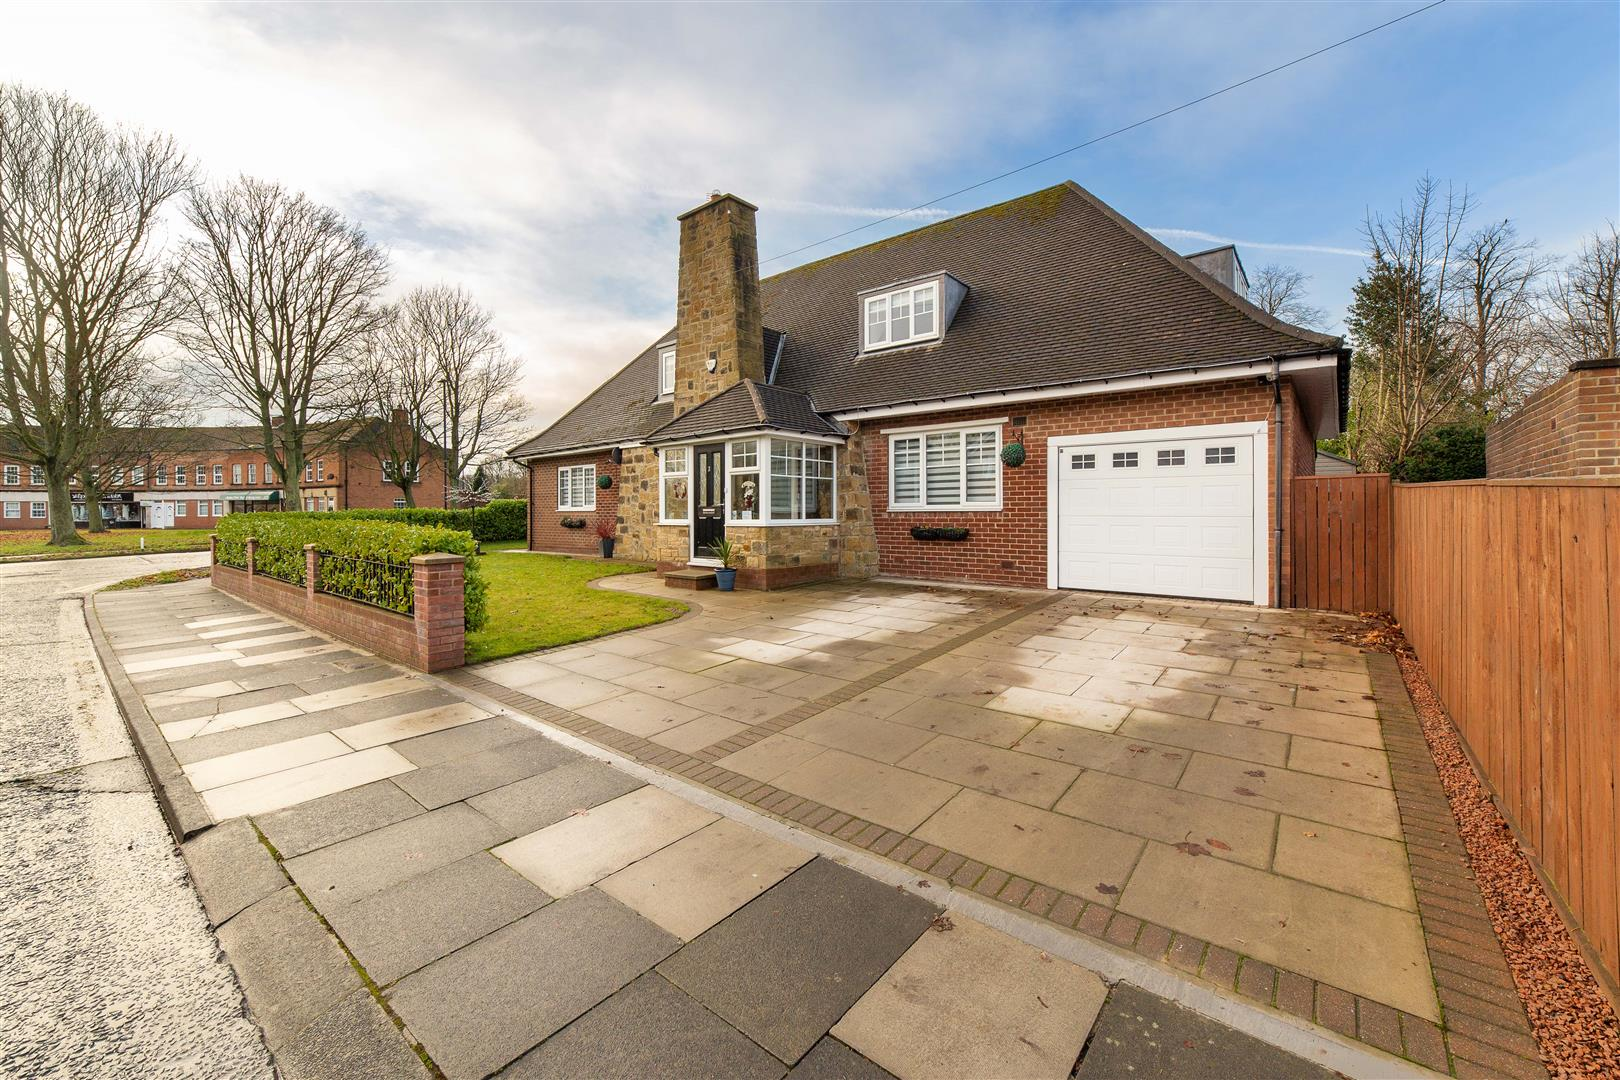 4 bed detached house for sale in Melton Park, NE3 5TA - Property Image 1